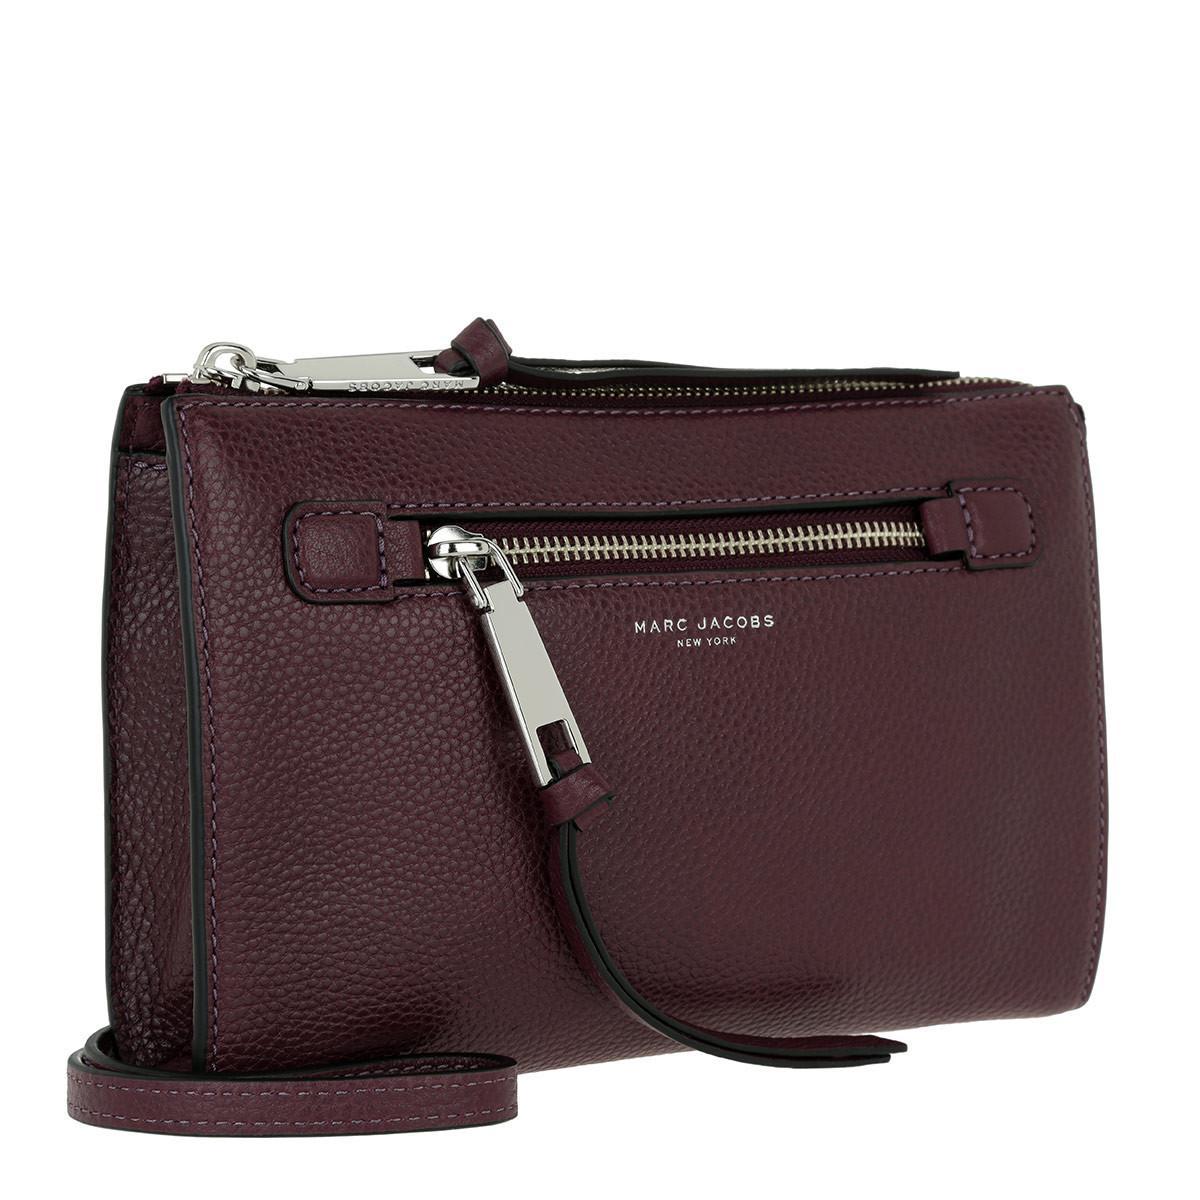 Marc Jacobs Leather Recruit Small Crossbody Bag Blackberry